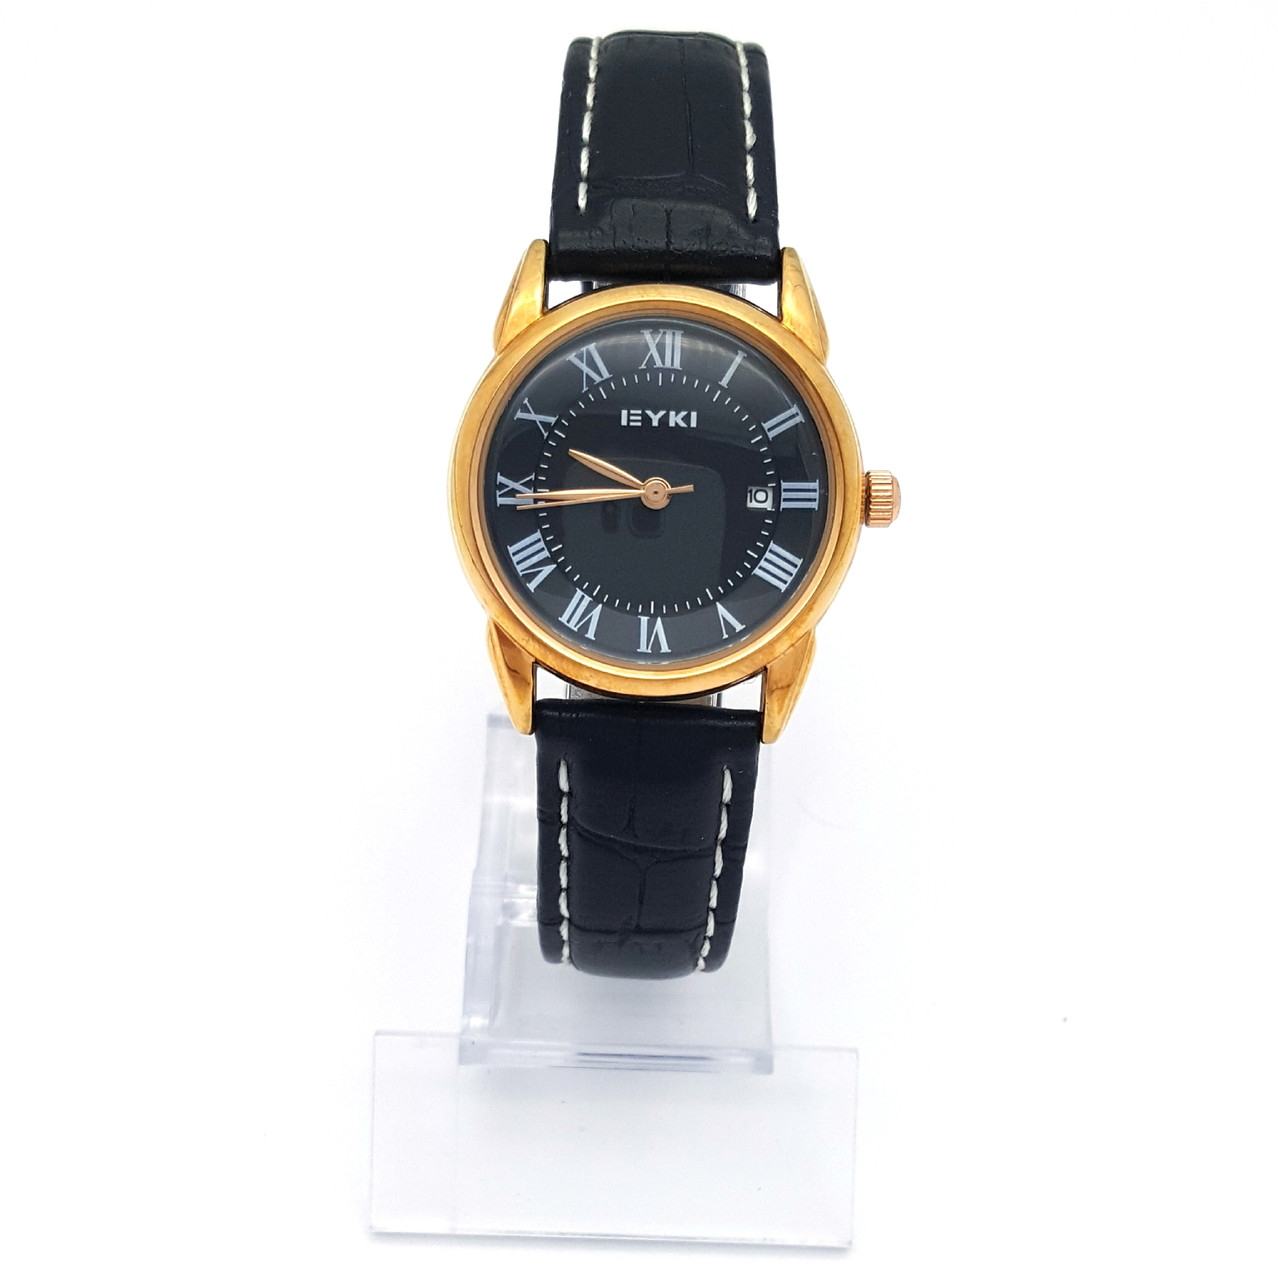 Часы EYKI, Черные, длина ремешка 15-19,5см, циферблат 28мм